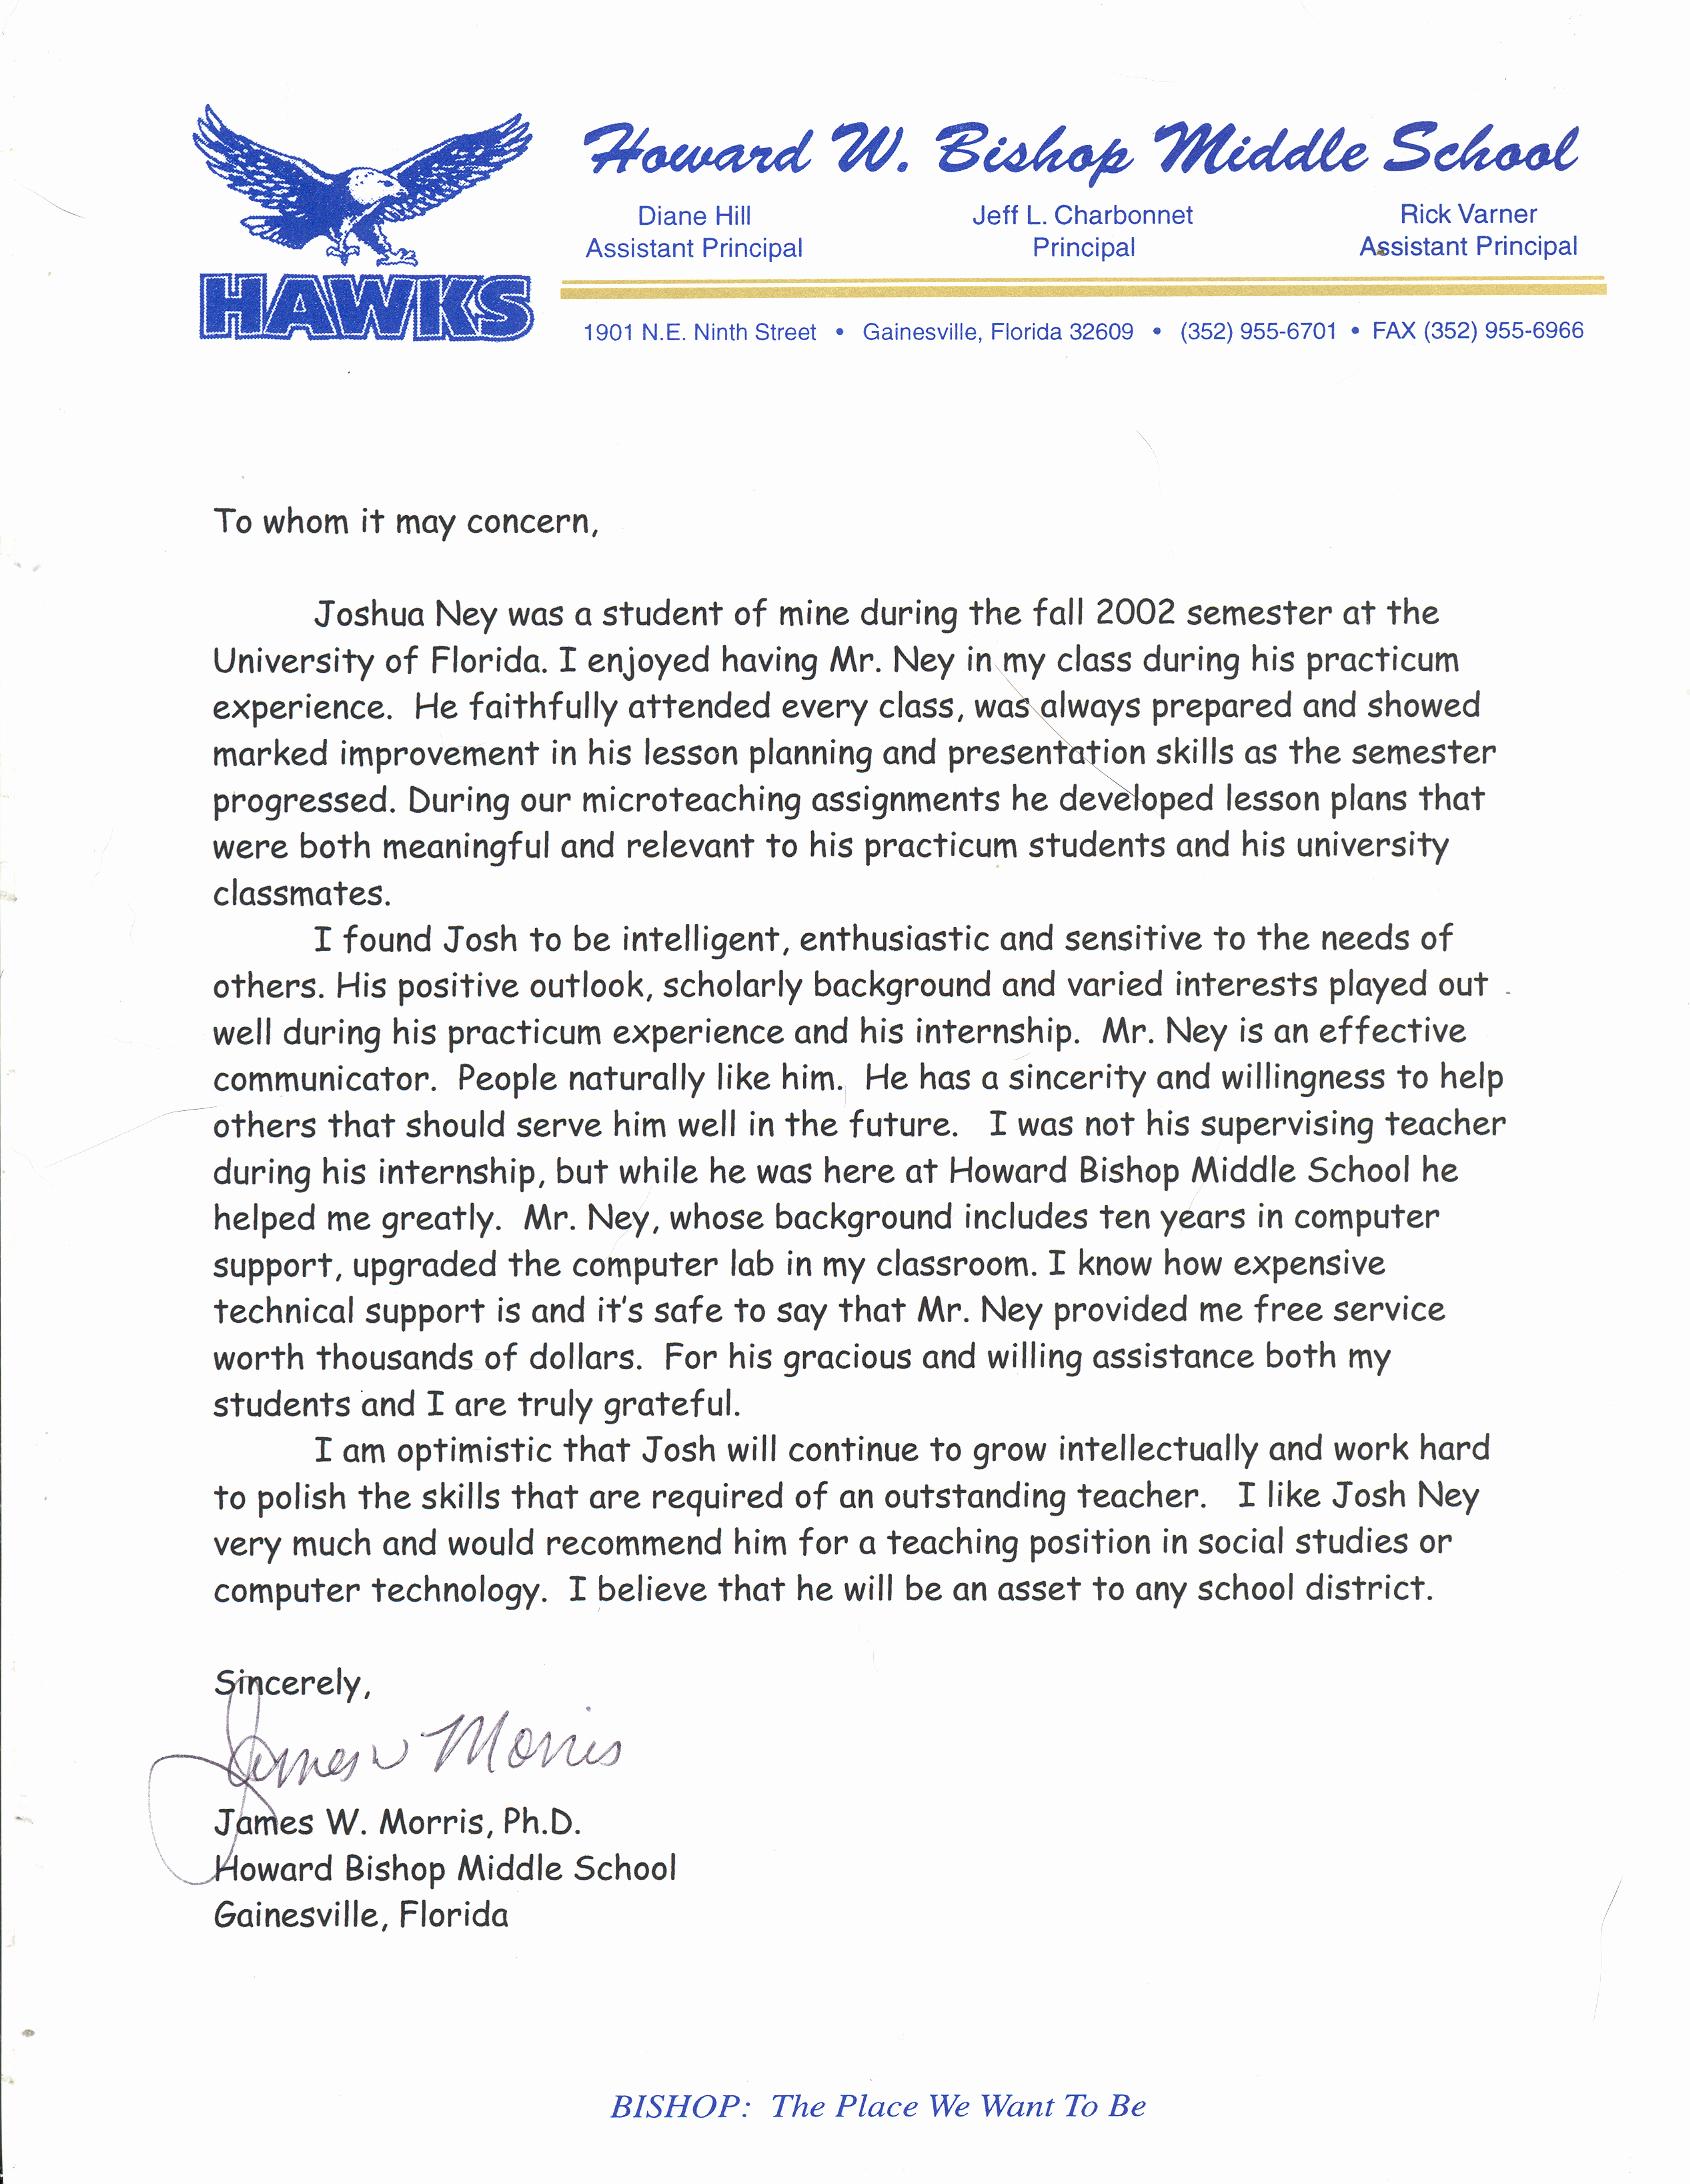 Letters Of Recommendation for Teachers Lovely Sample Letter Of Re Mendation for Teacher